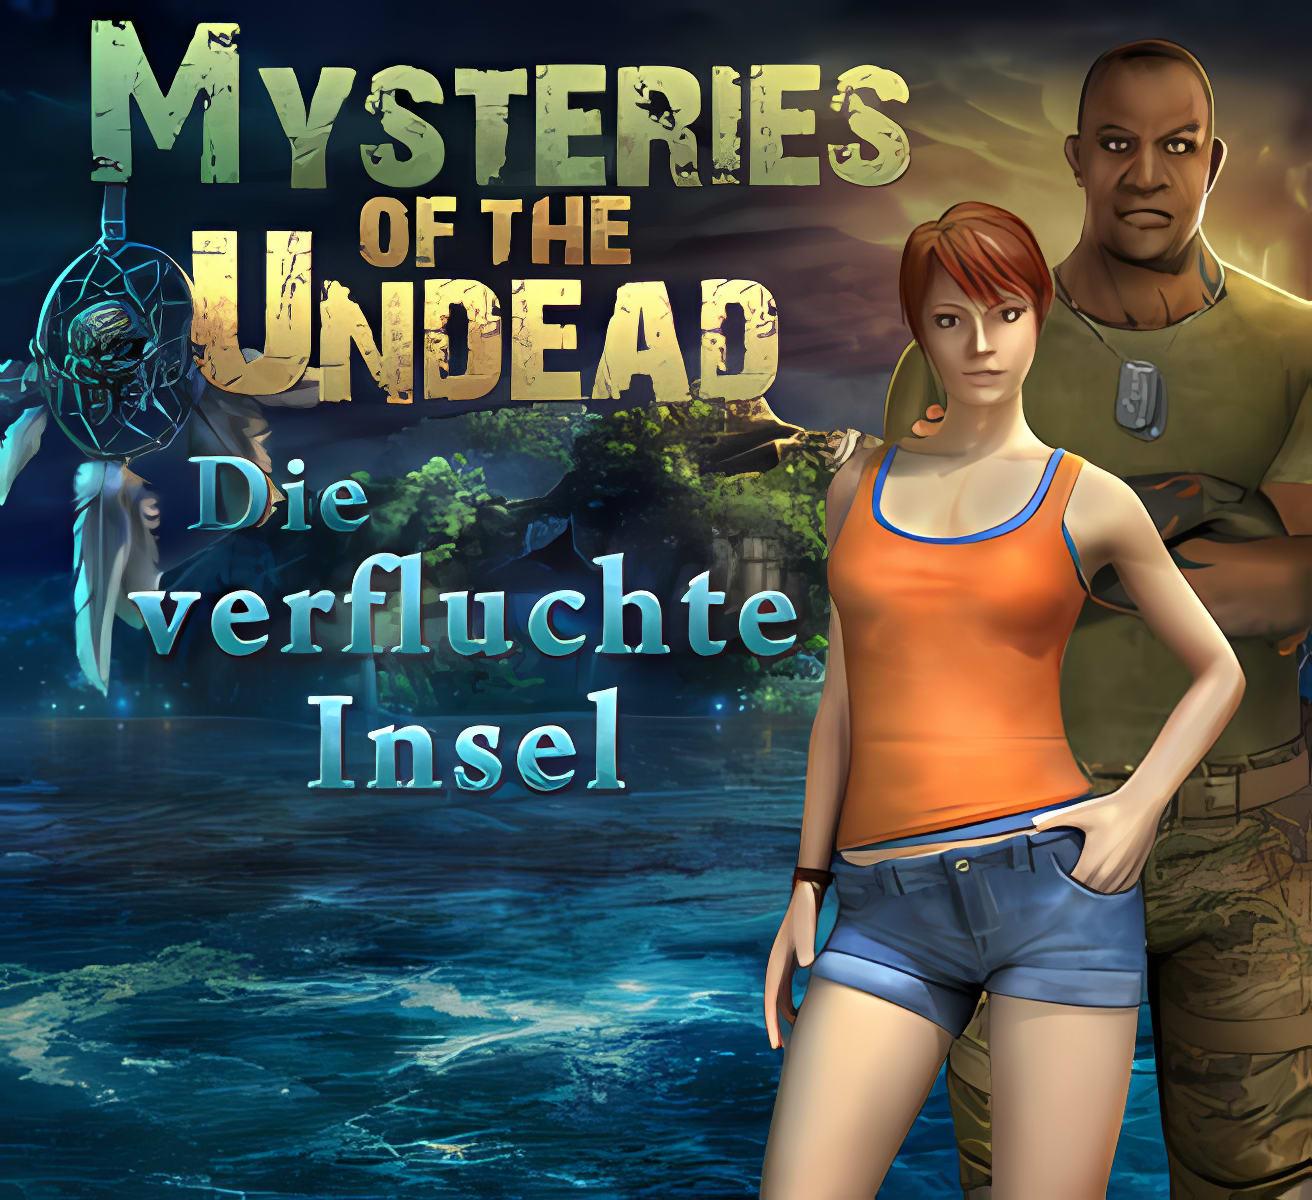 Mysteries of the Undead: Die verfluchte Insel 1.0.0.46